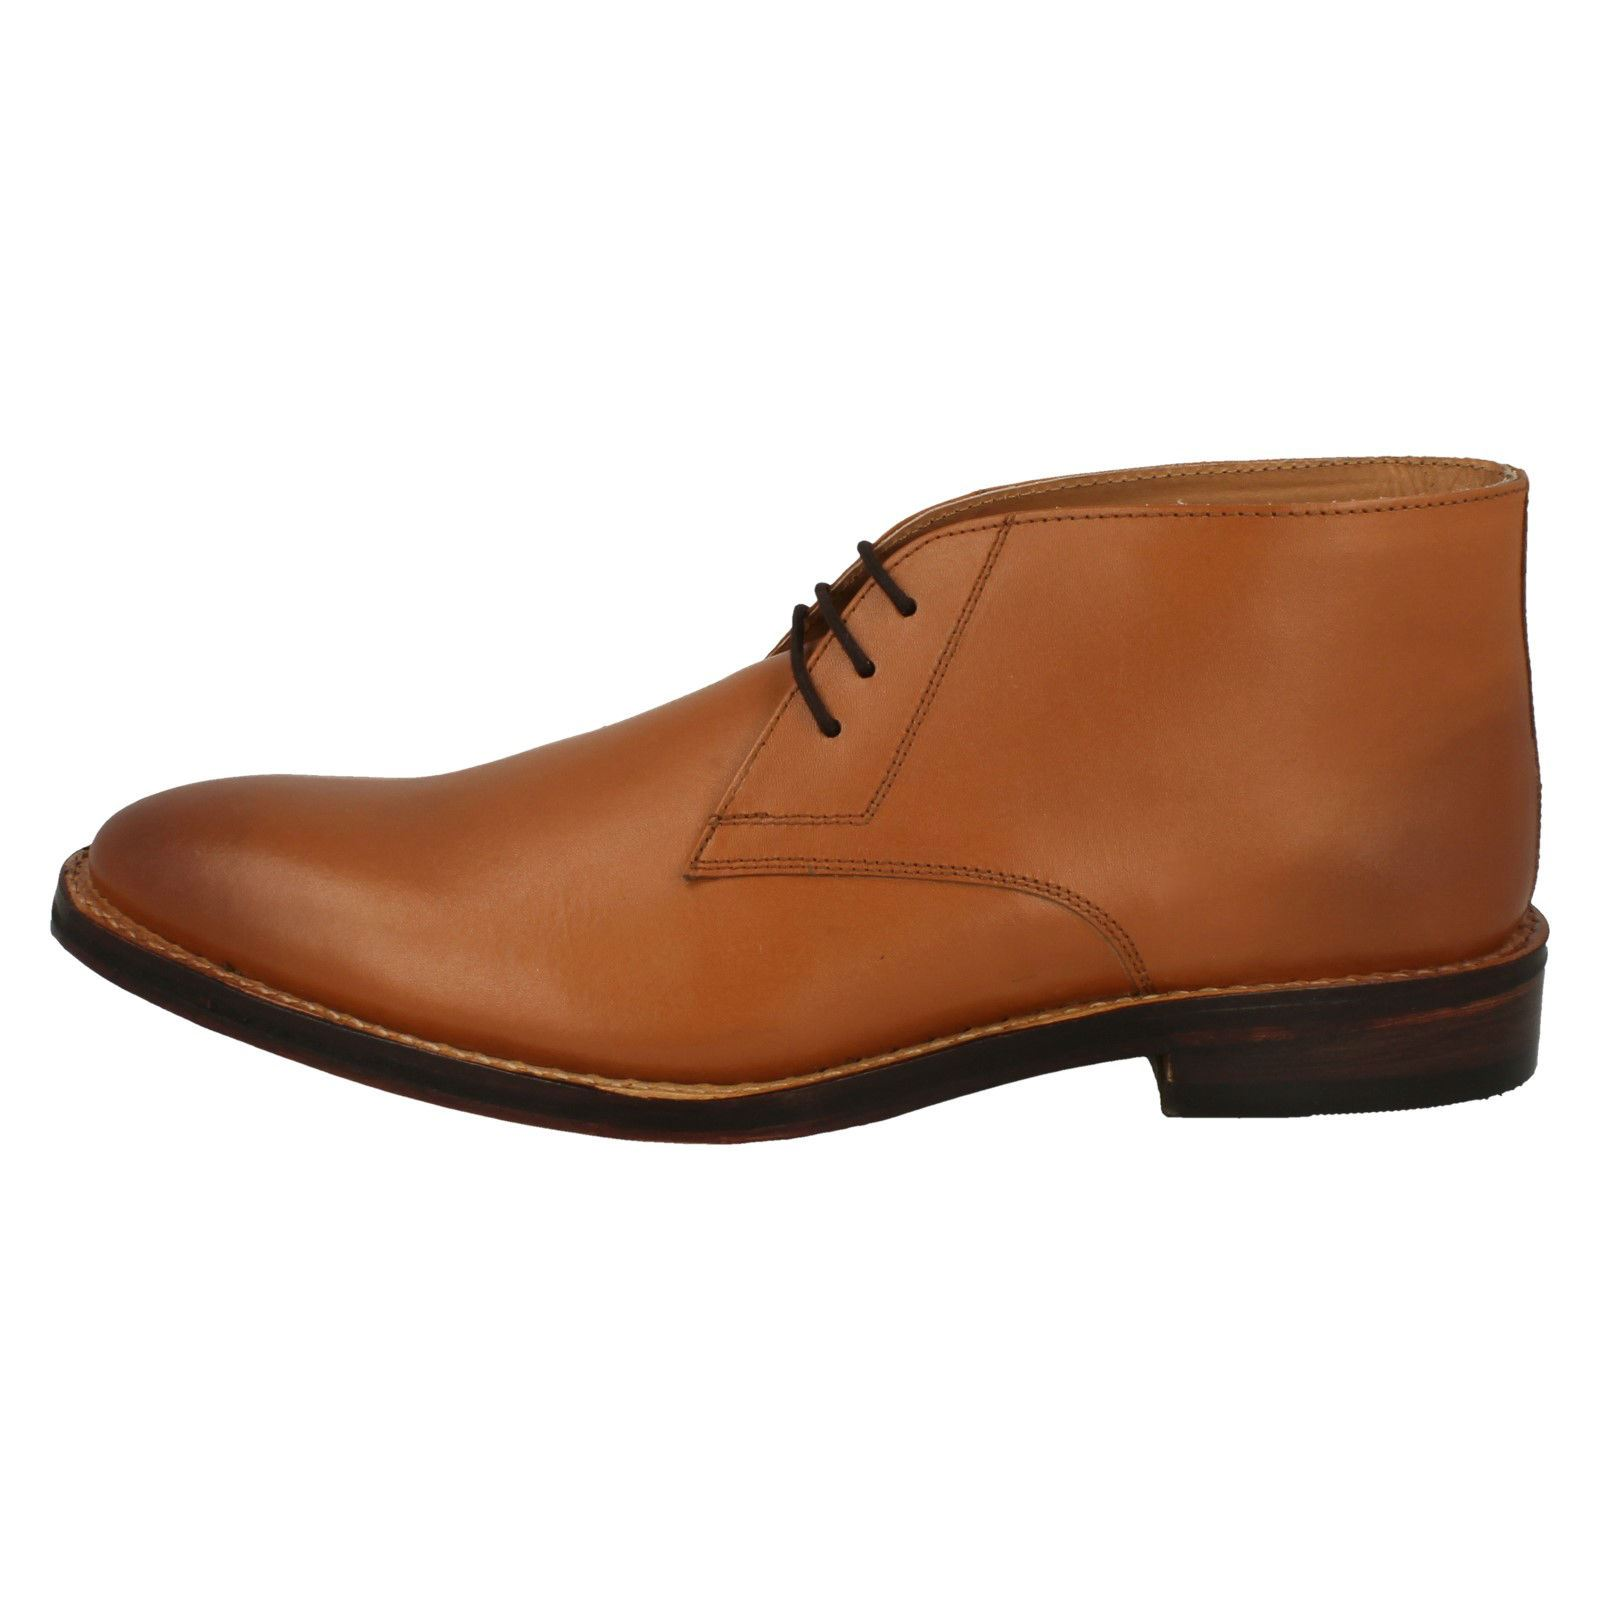 Mens-Catesby-Smart-Desert-Boot-MCW159T thumbnail 4